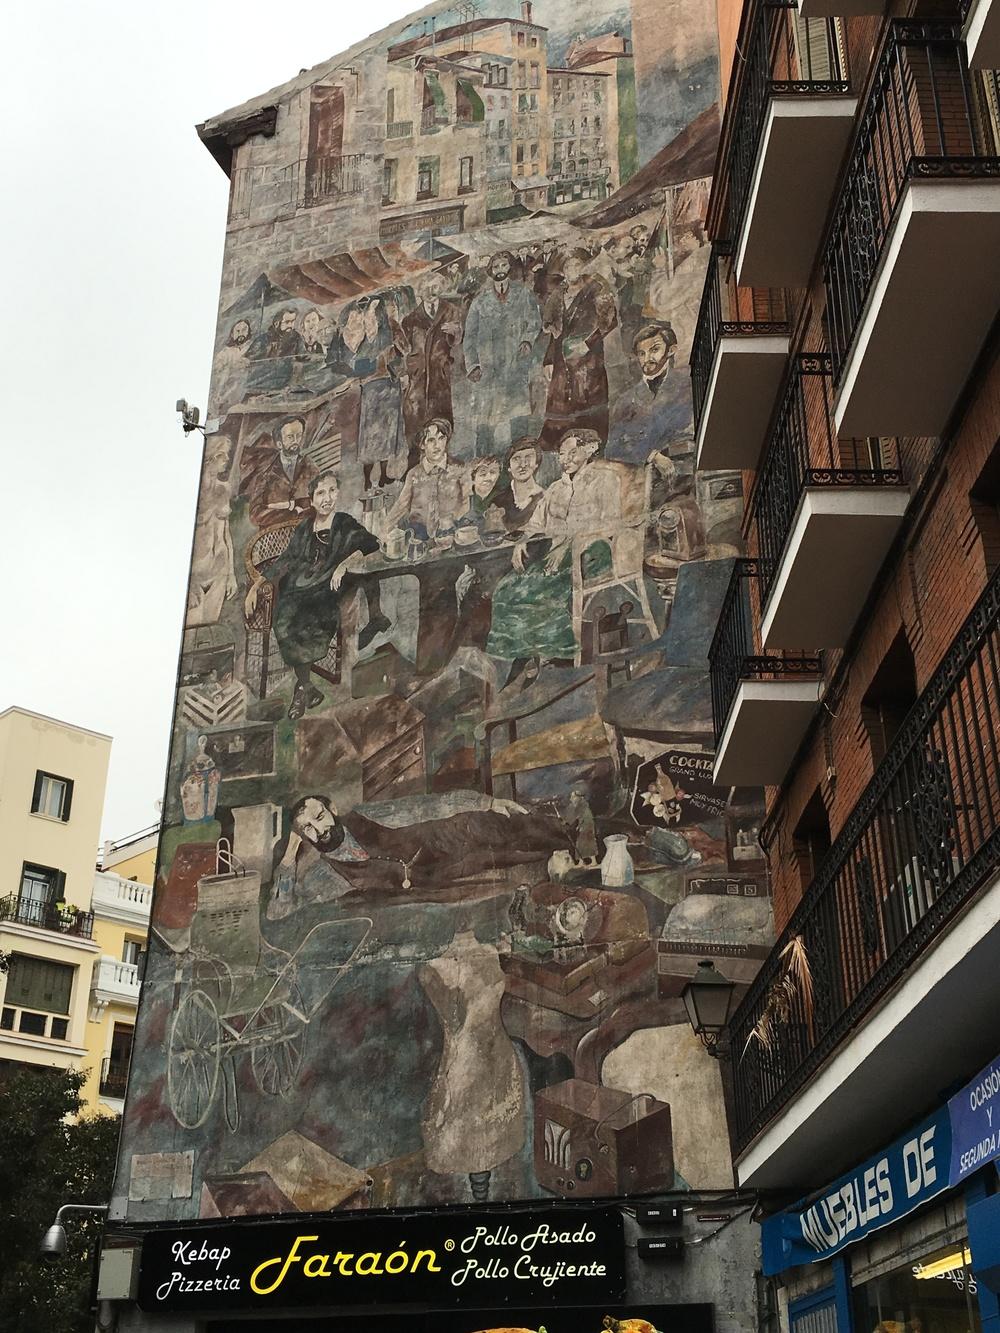 The mural at the famous El Rastro flea market